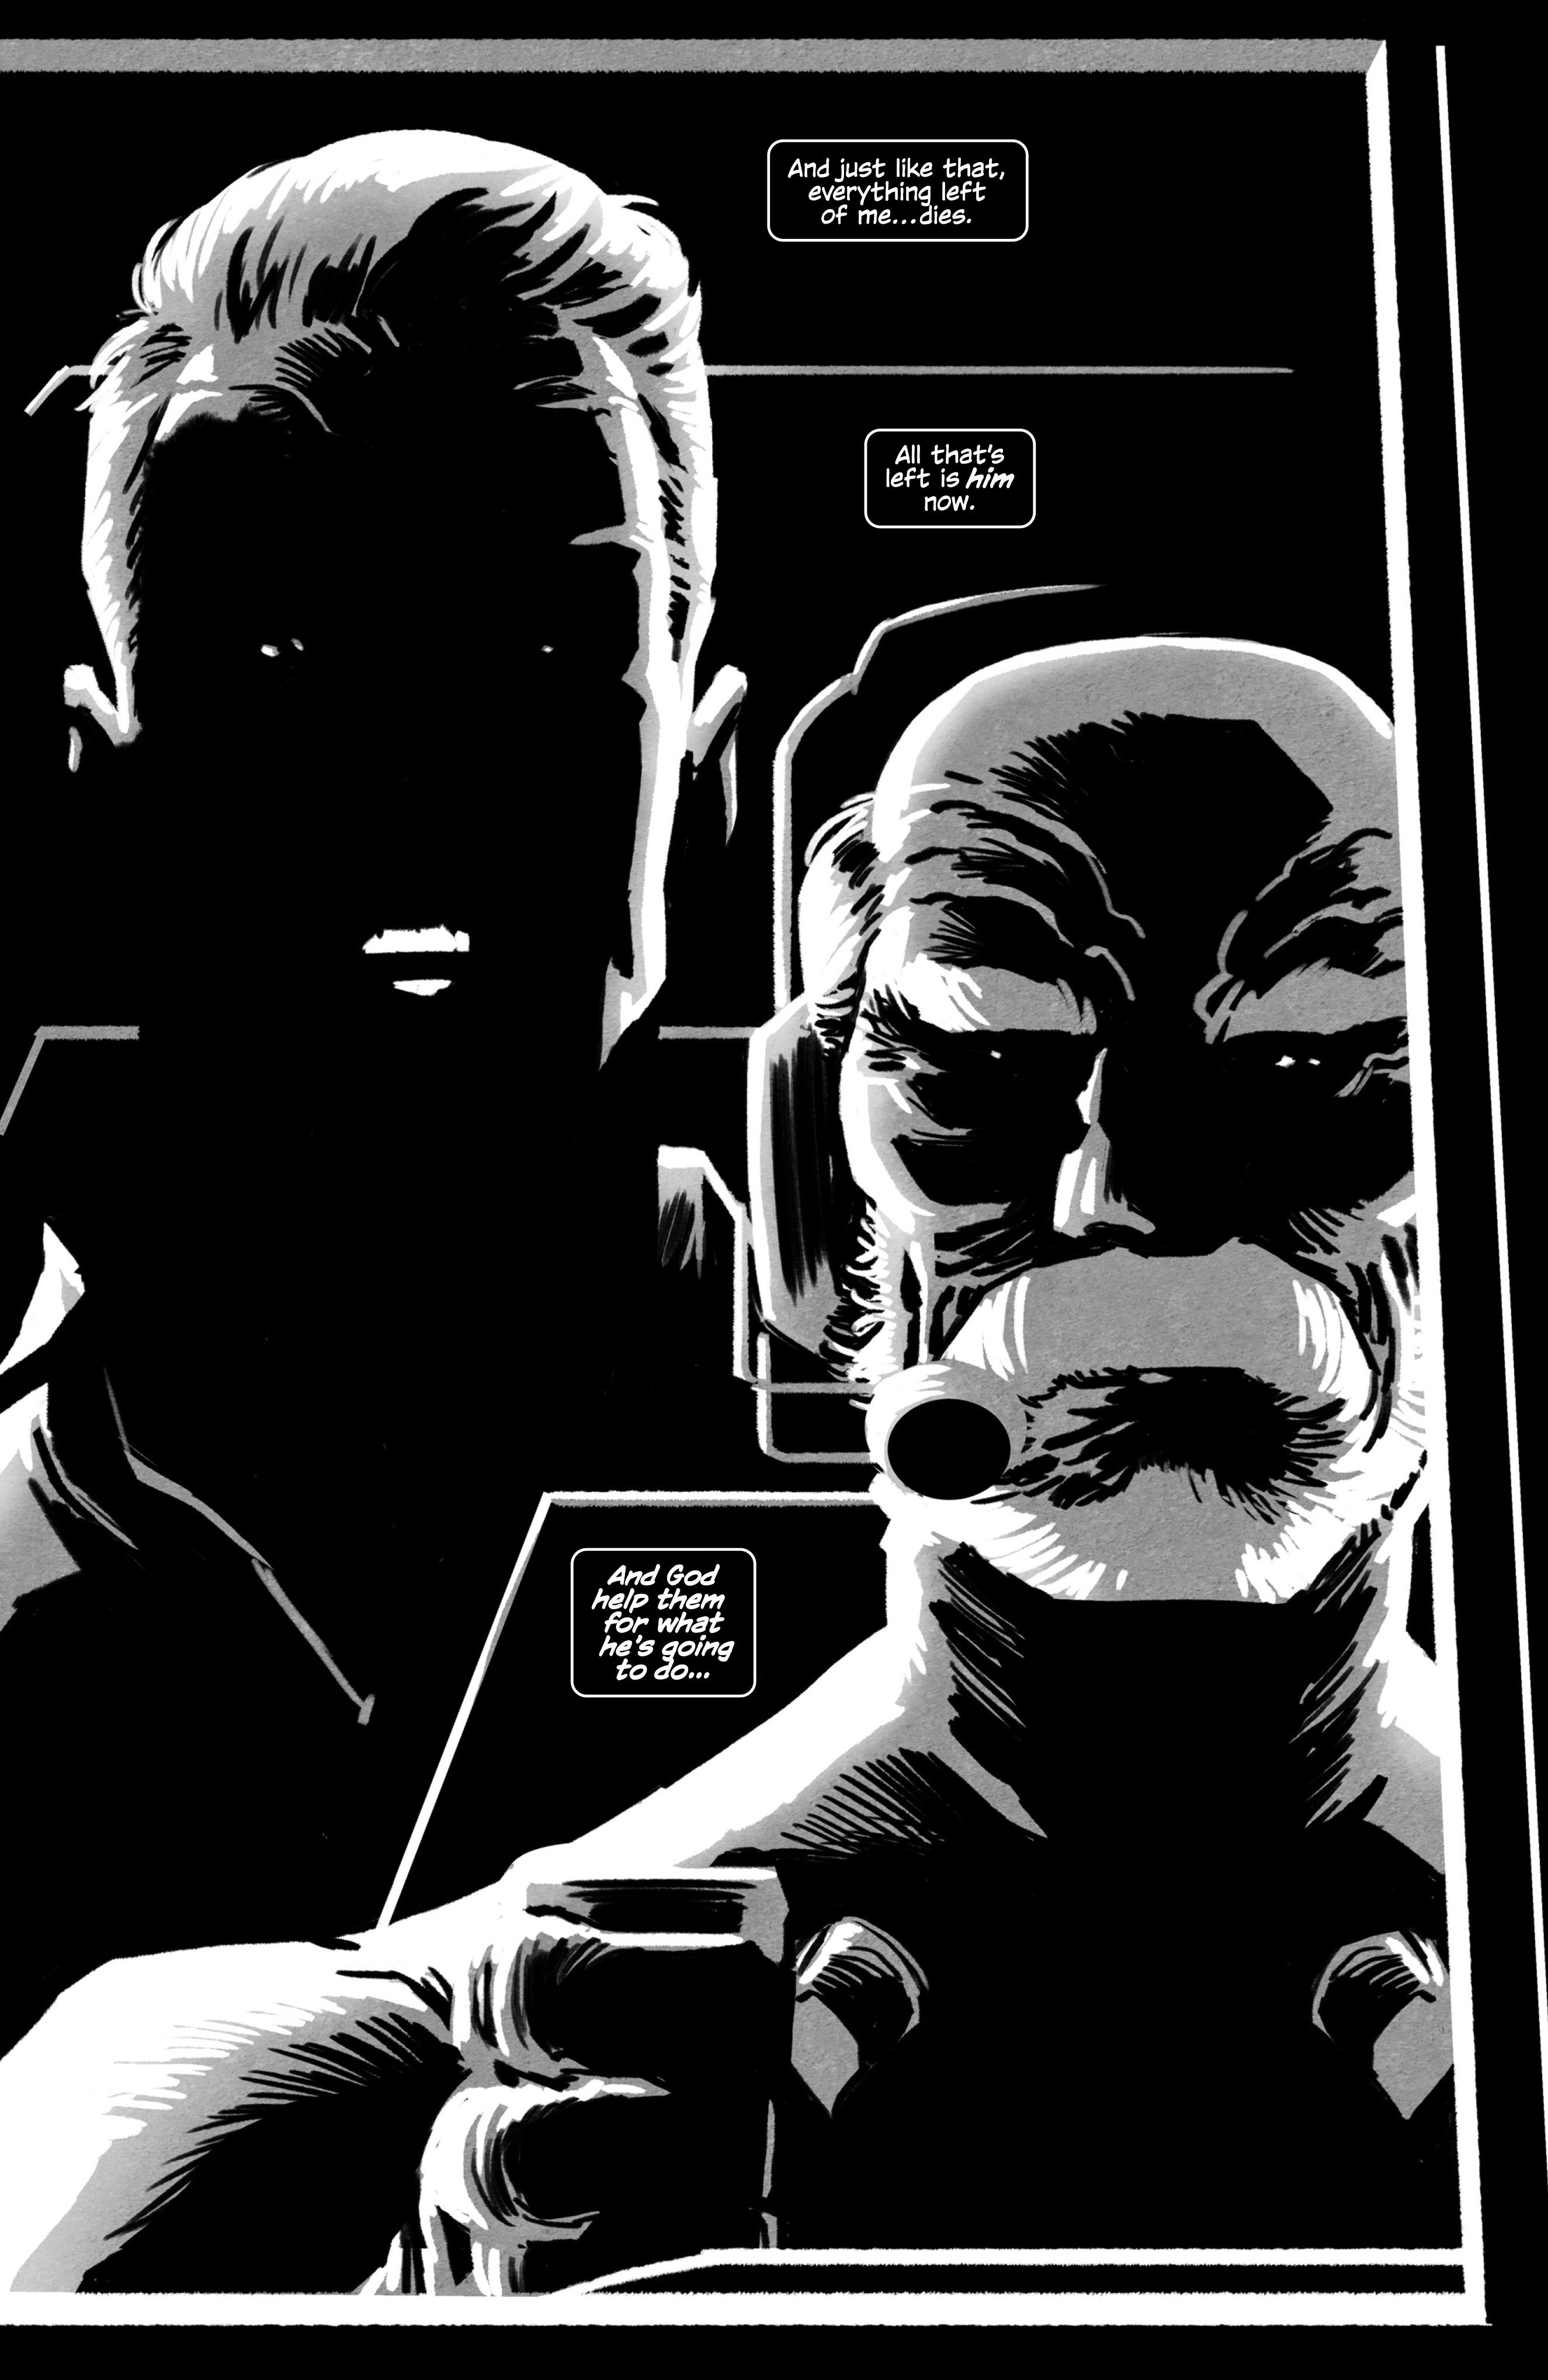 Read online Renato Jones, Season 2: Freelancer comic -  Issue #1 - 8